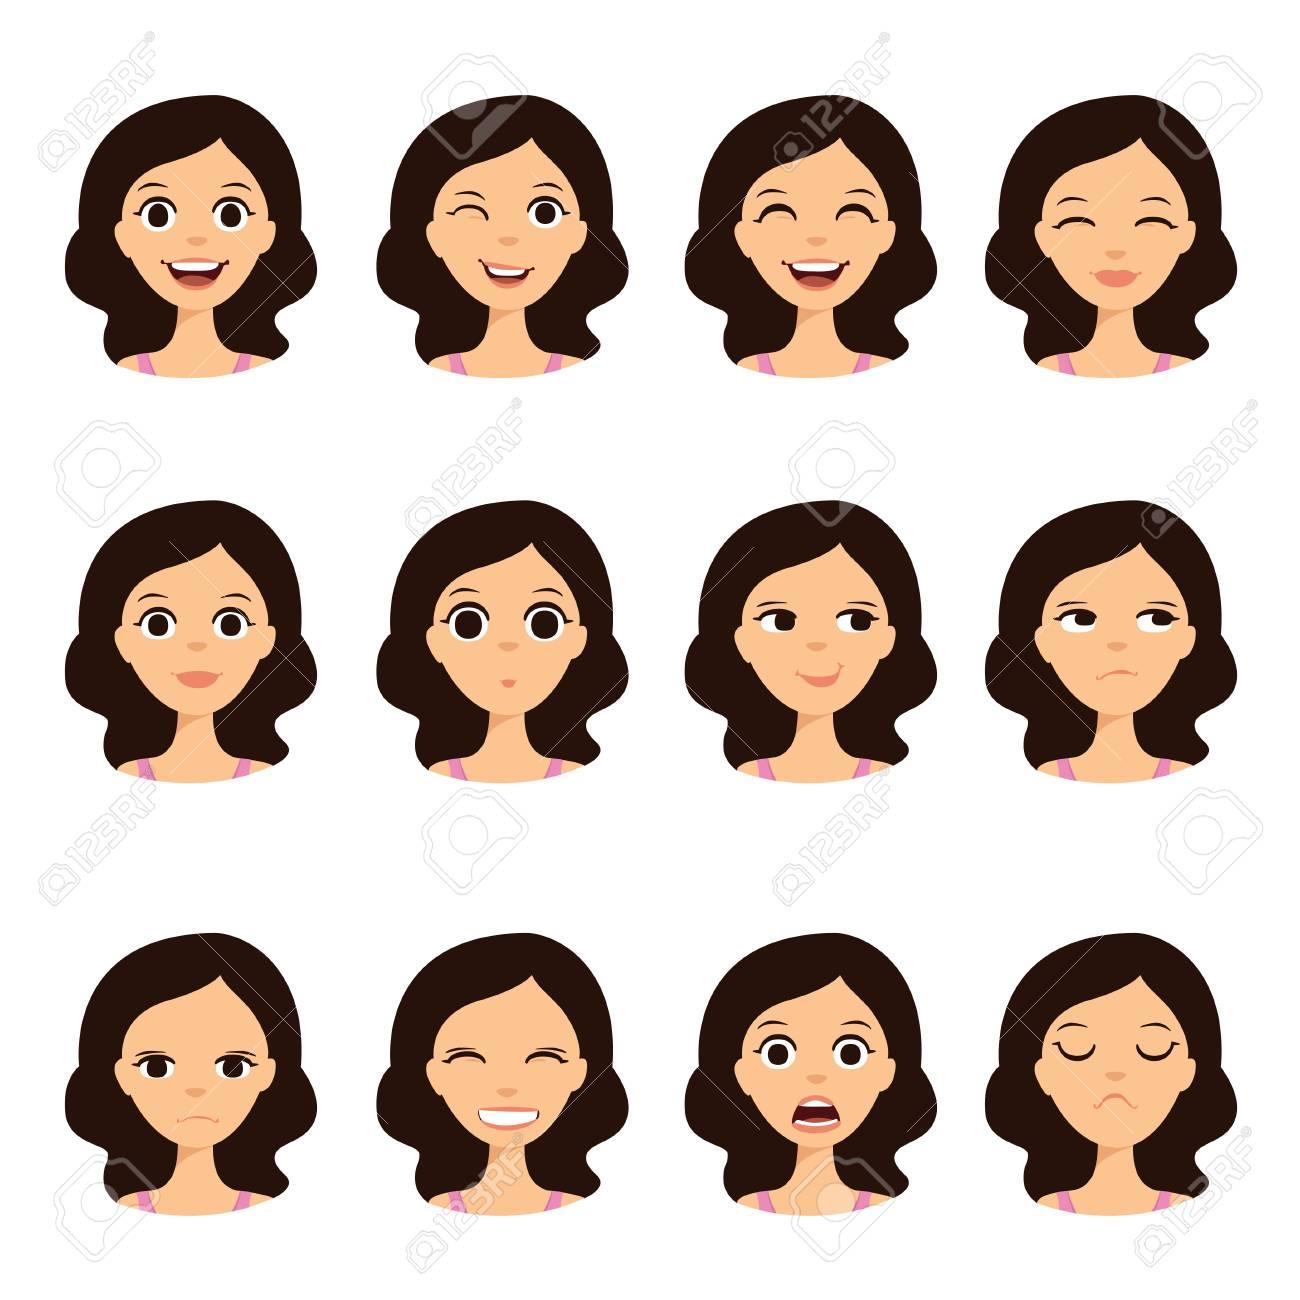 Girl Emotion Faces Cartoon Vector Illustration Woman Emoji Face